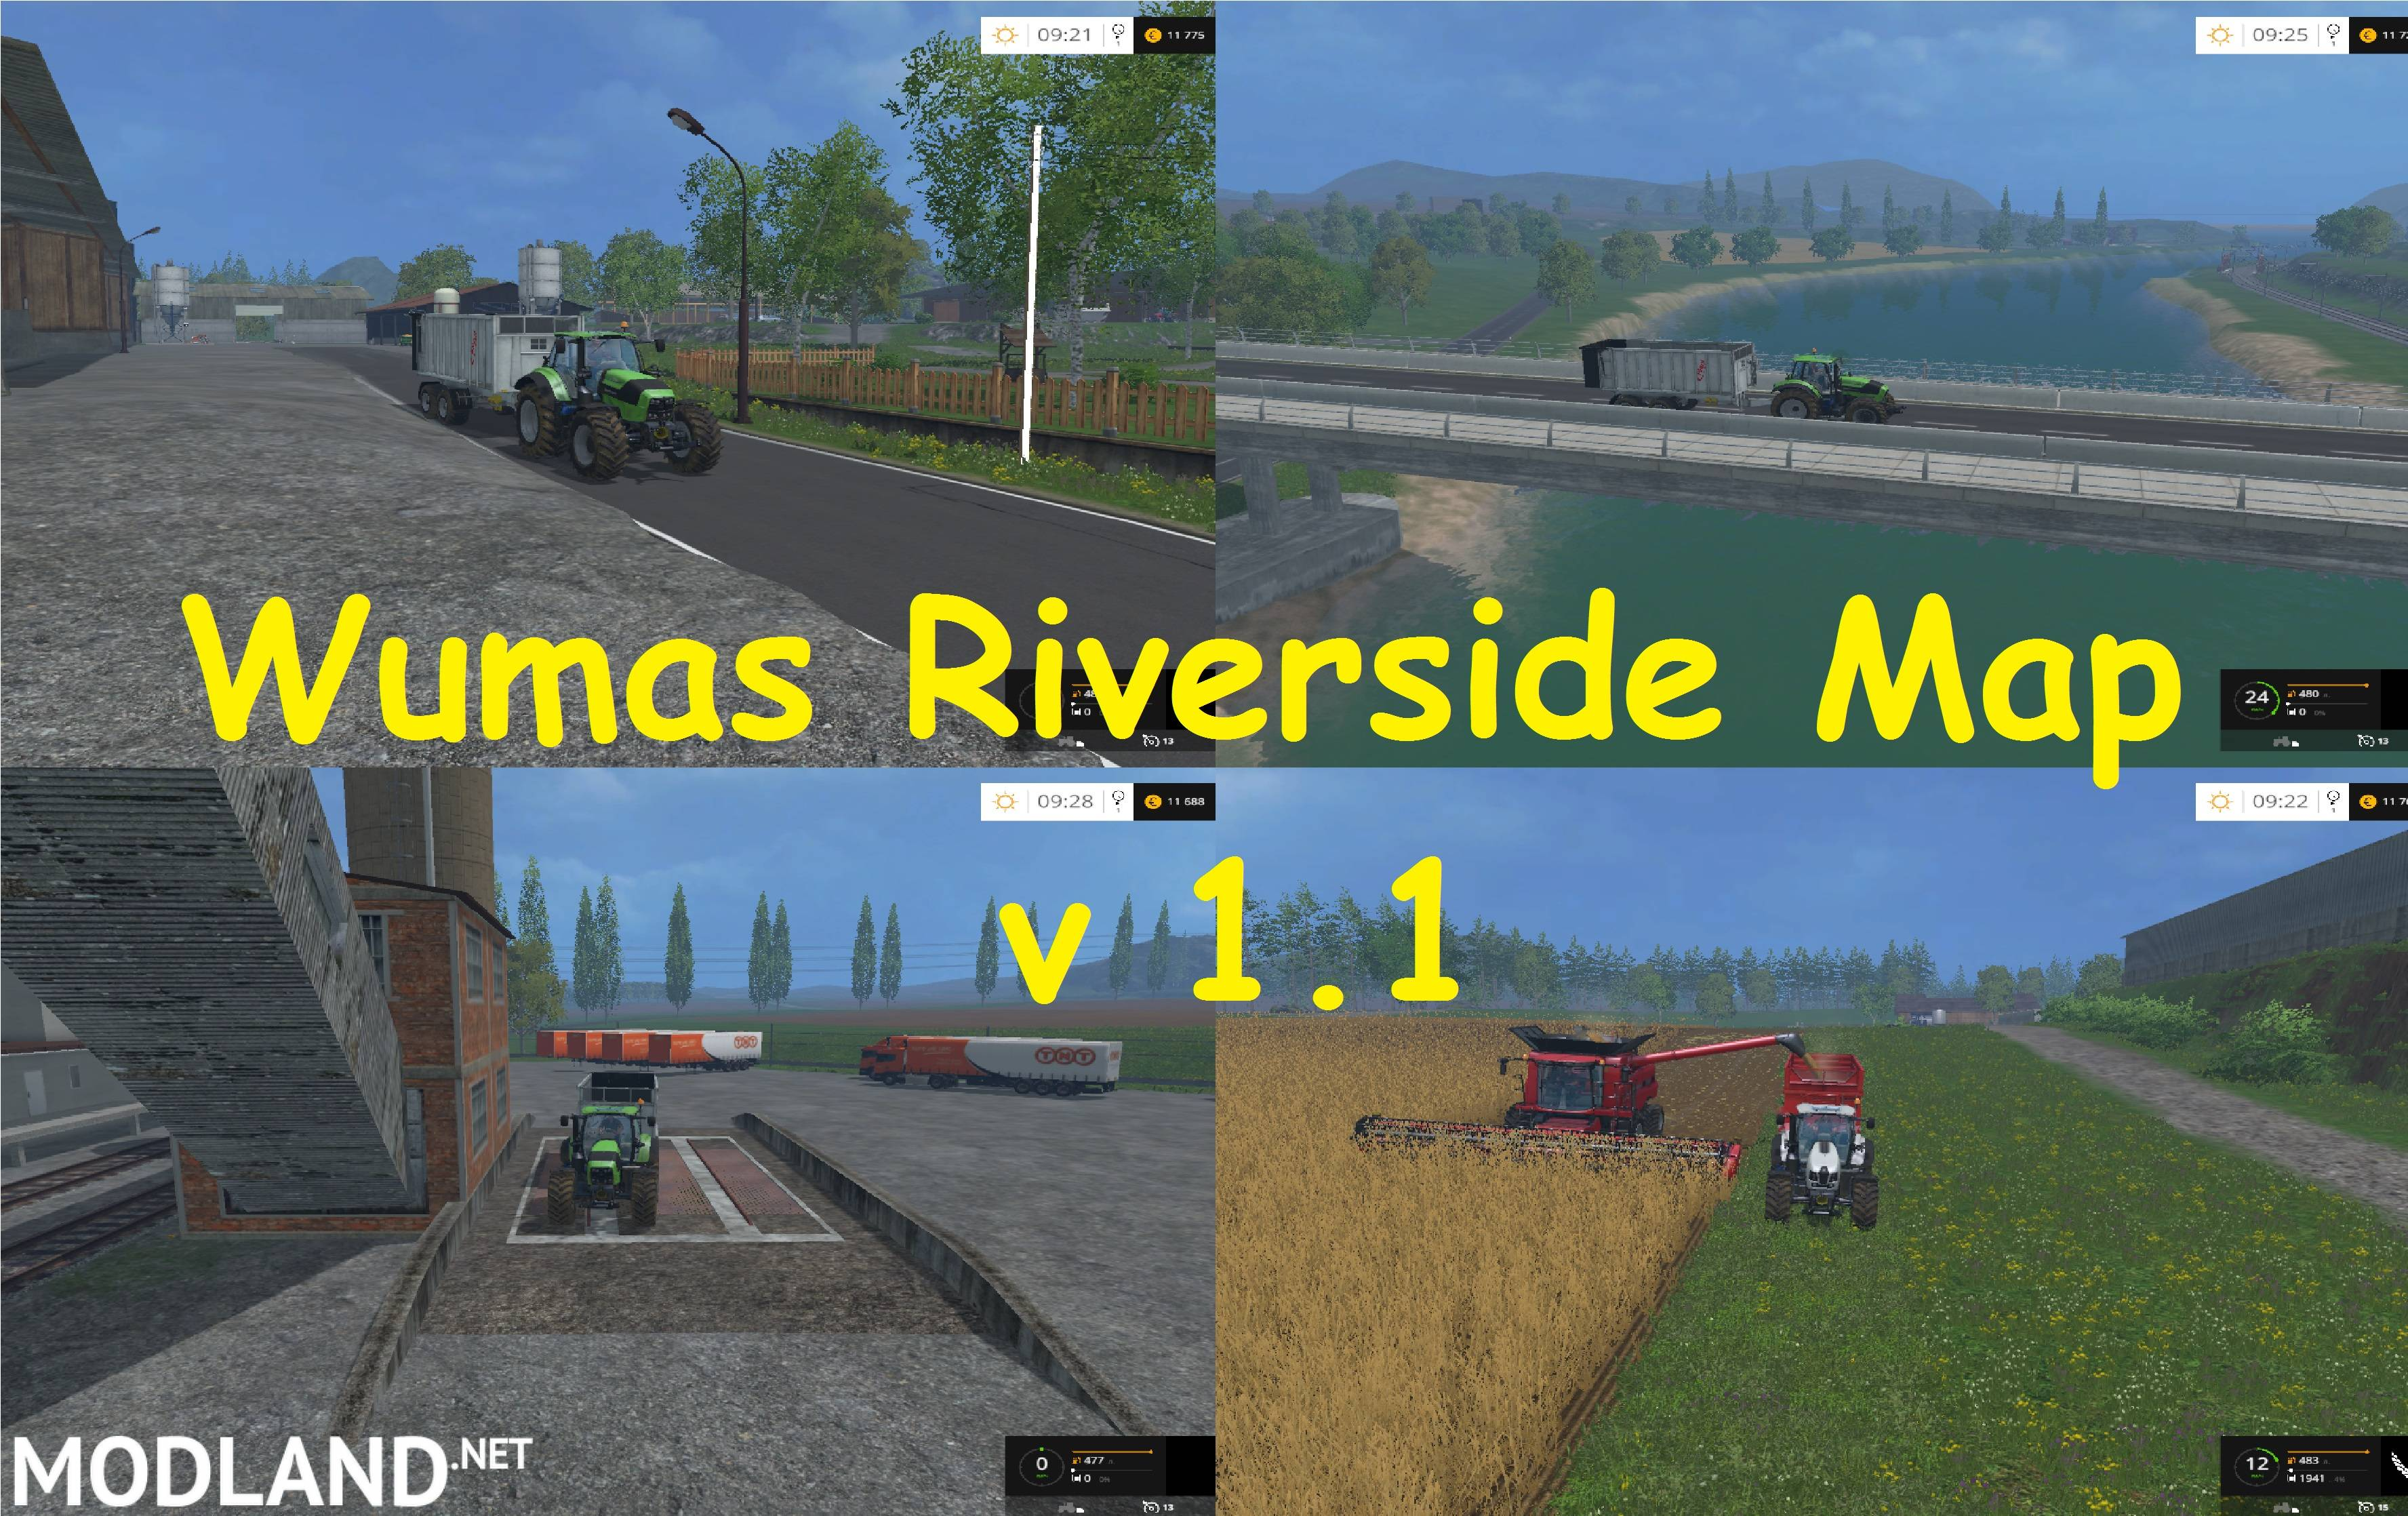 Wumas Riverside Map v 1.1 mod for Farming Simulator 2015 / 15 | FS, LS 2015 mod